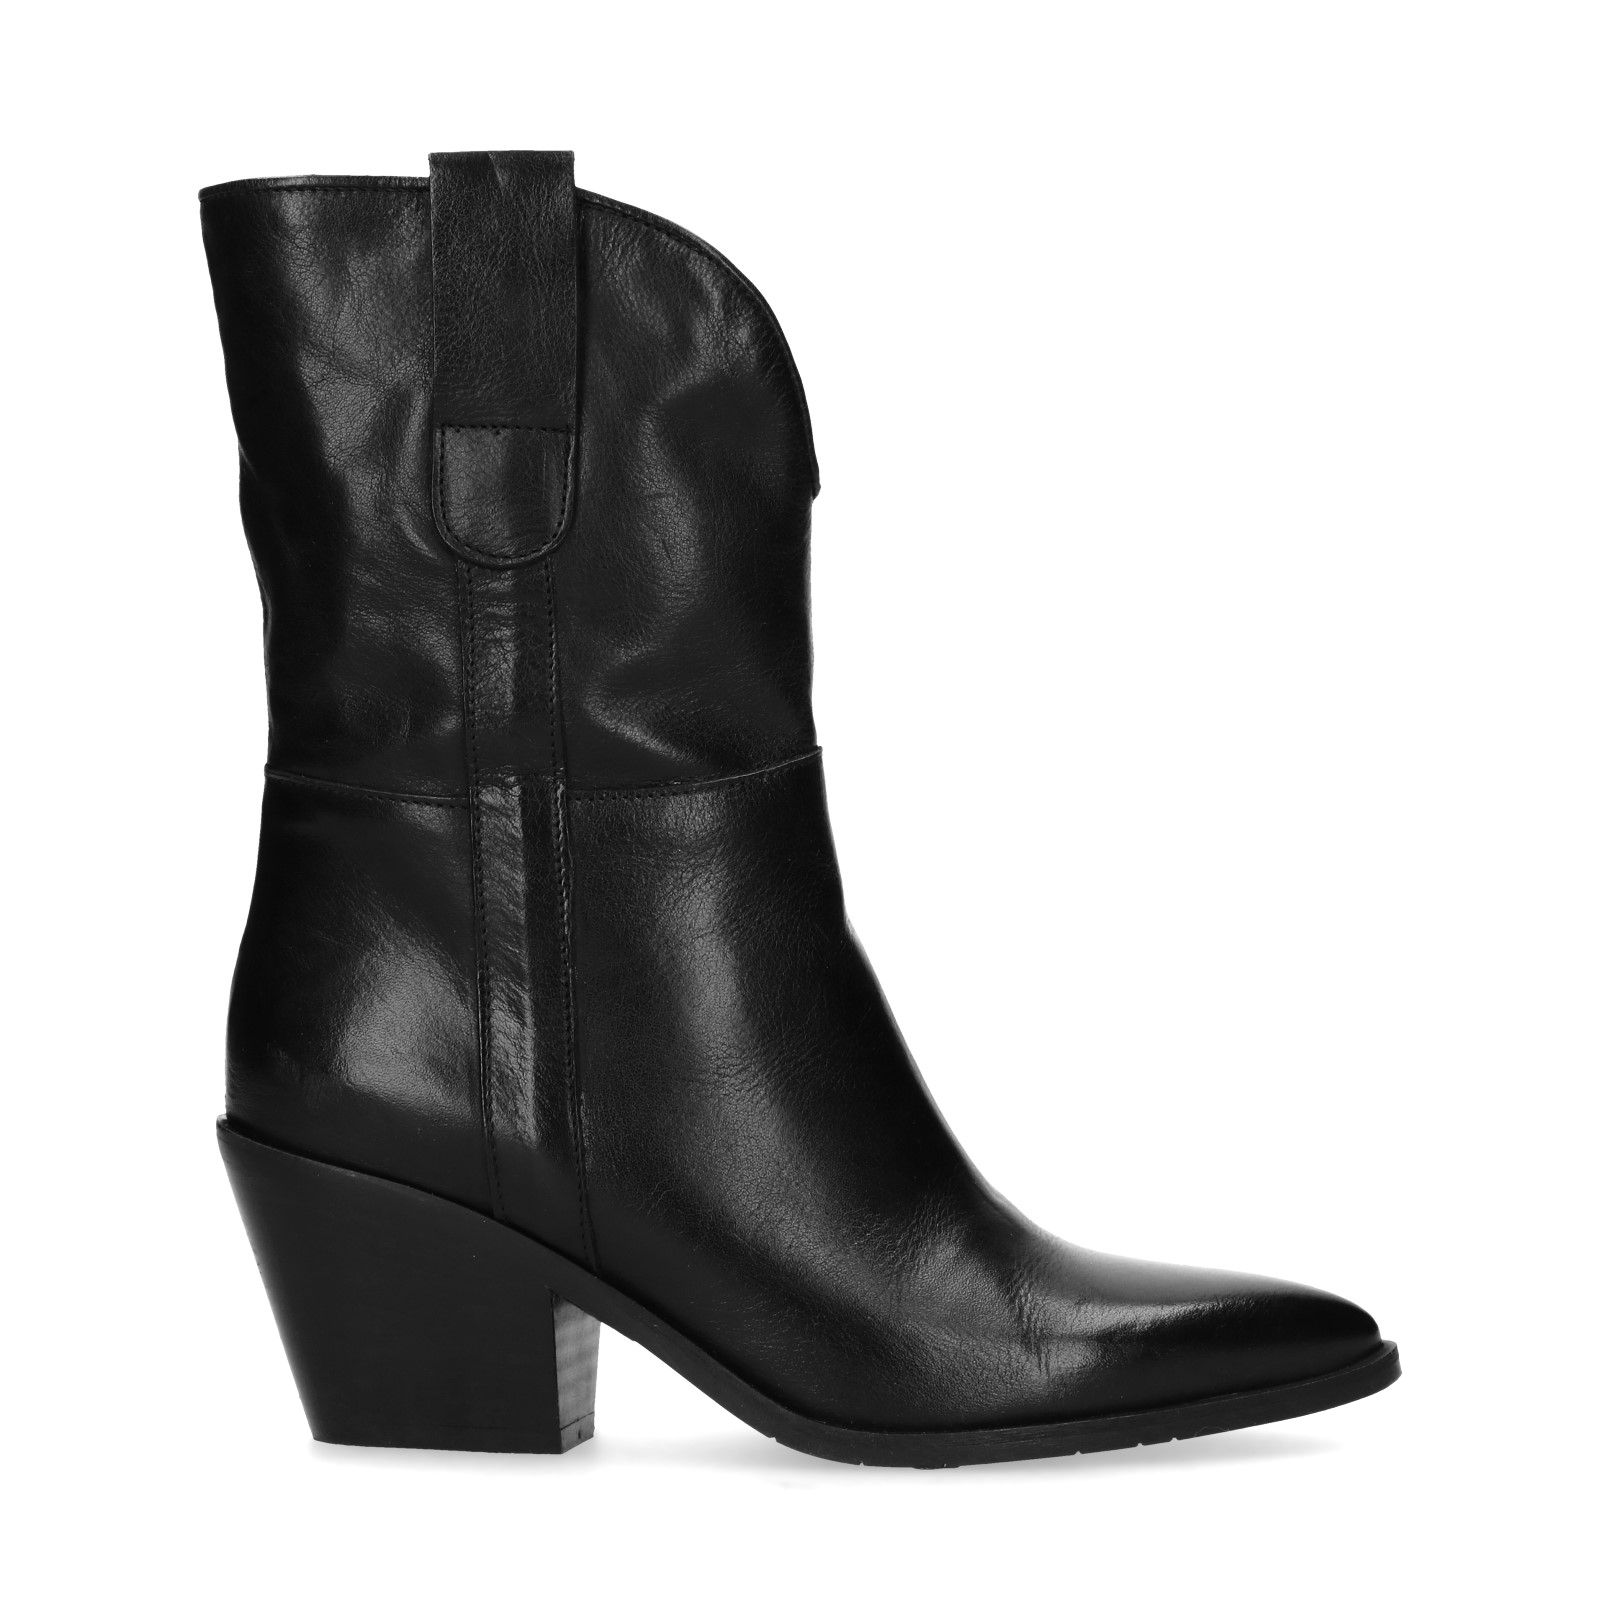 Zwarte western laarzen met hak Dames   MANFIELD